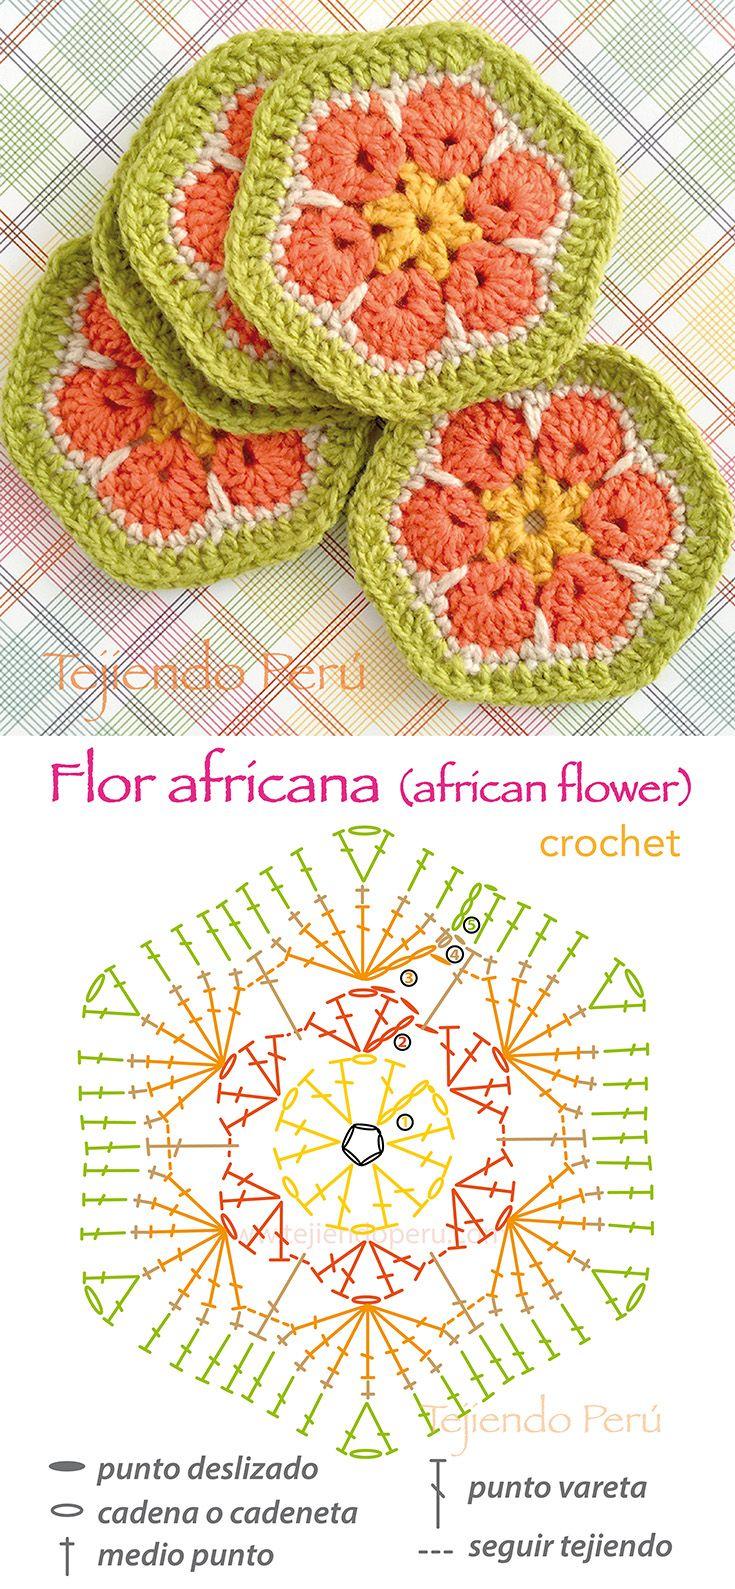 Crochet: Flor africana o african flower! Diagrama y video tutorial :)